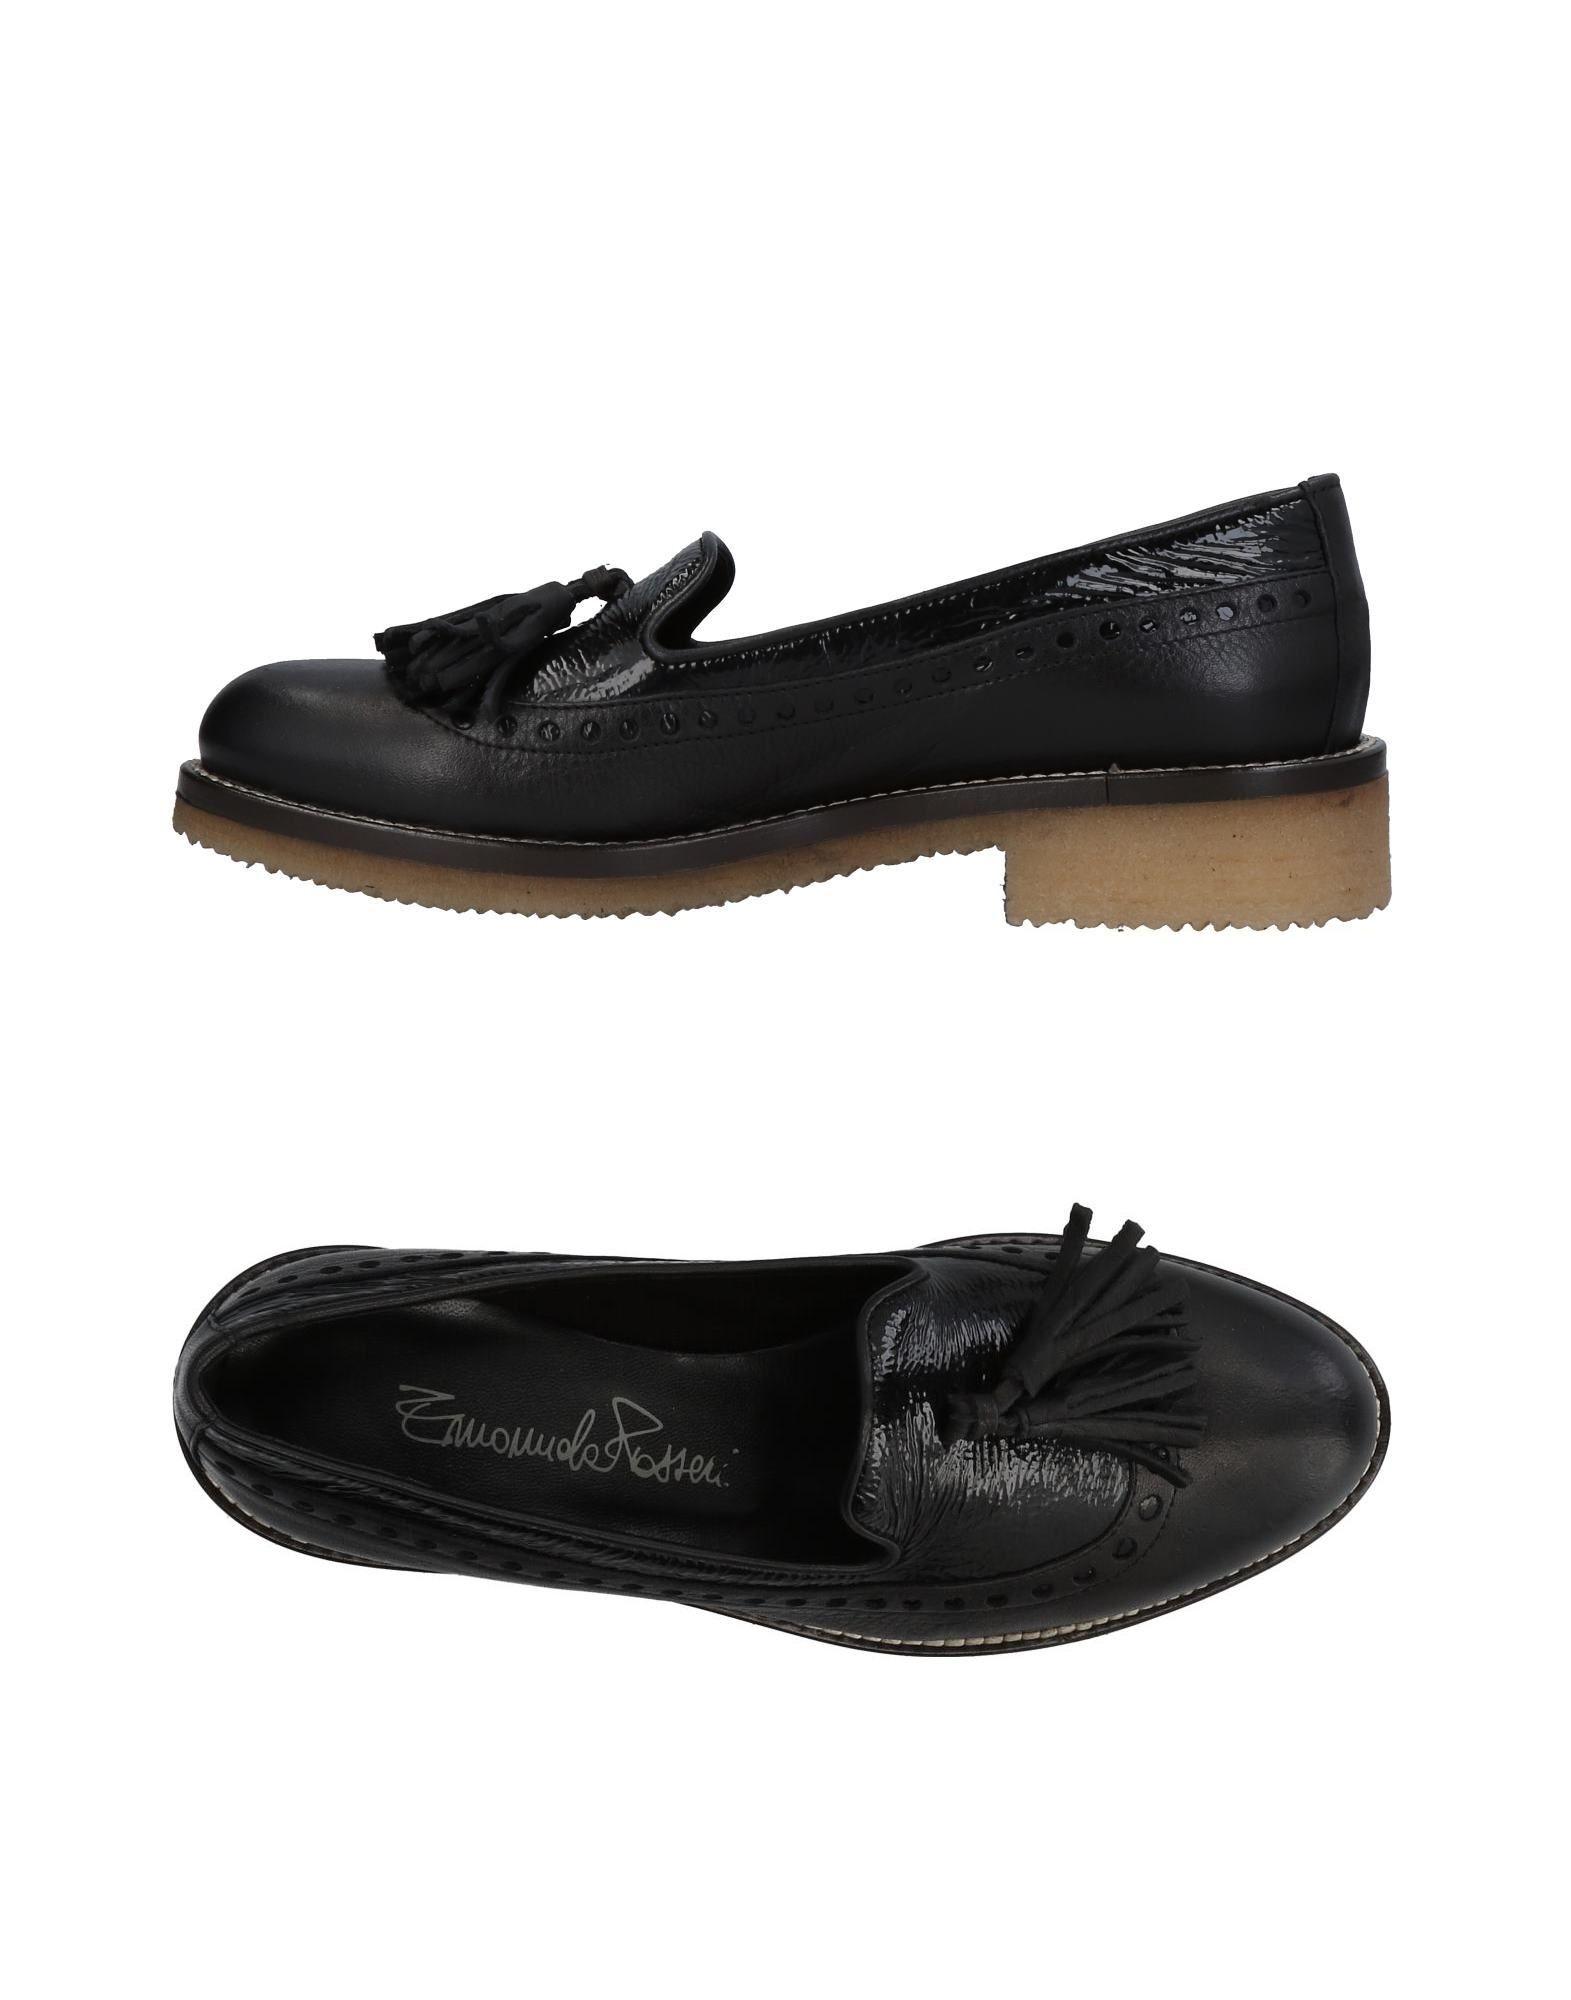 Emanuela Passeri Mokassins Damen  11444601TQ Gute Qualität beliebte Schuhe